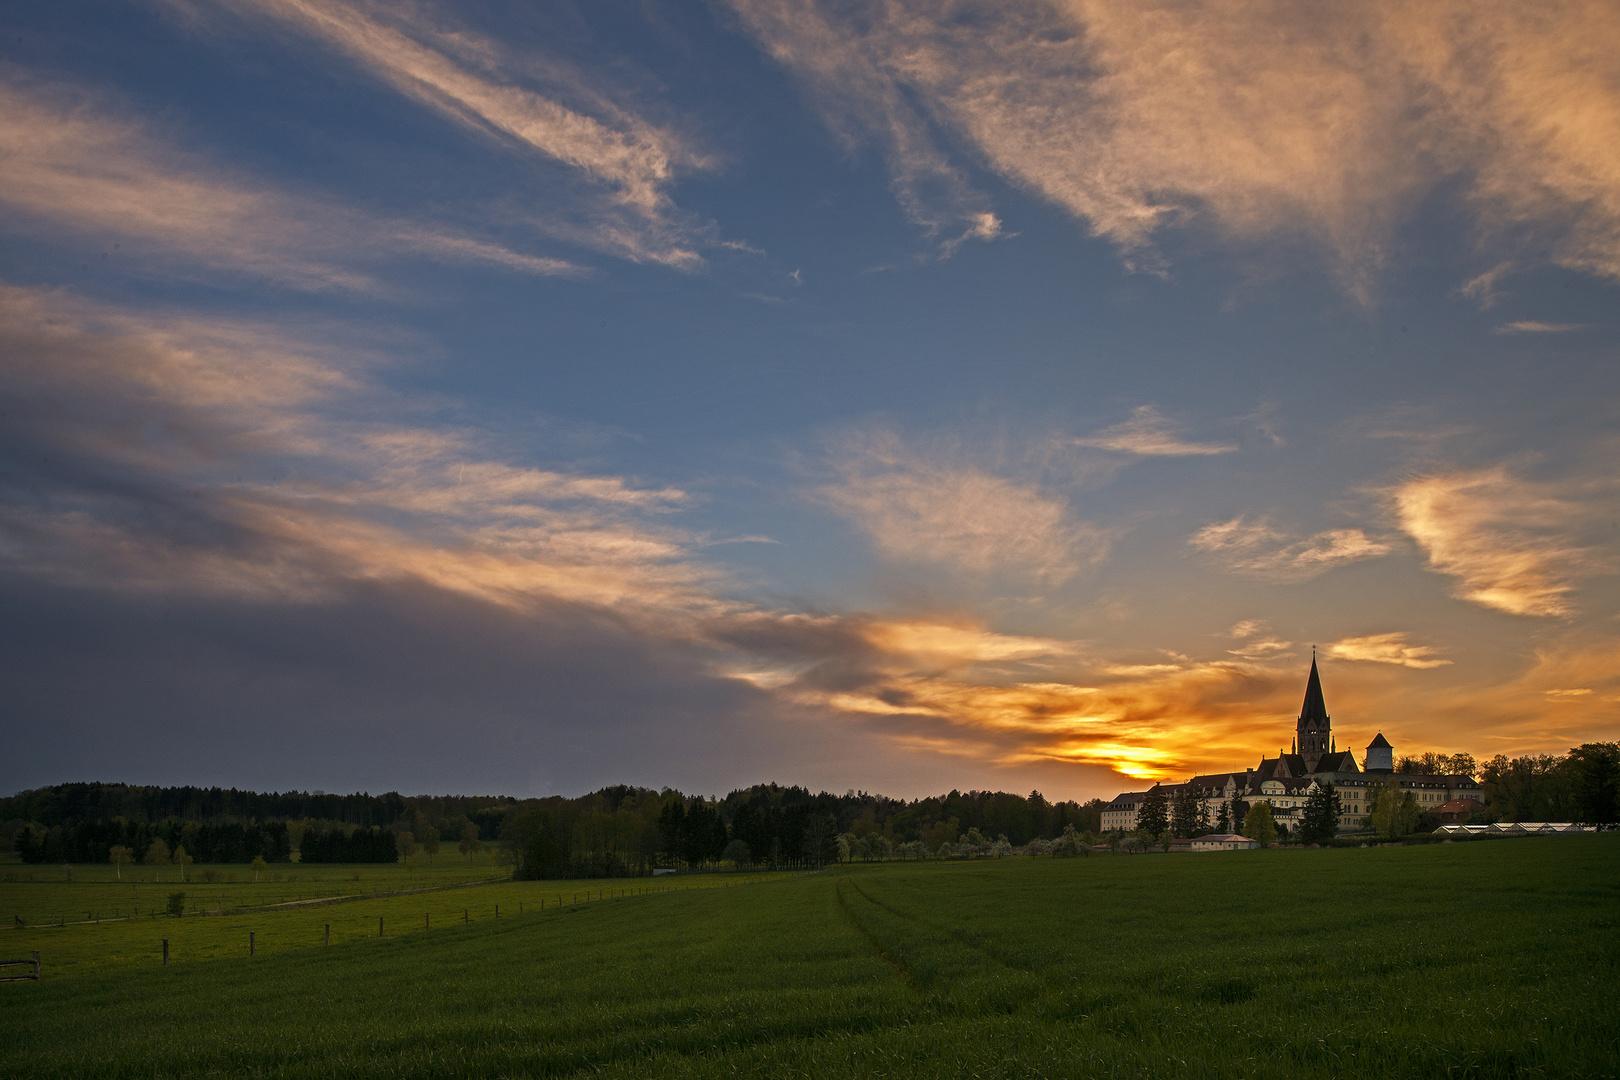 Erzabtei St. Ottilien - Sonnenuntergang